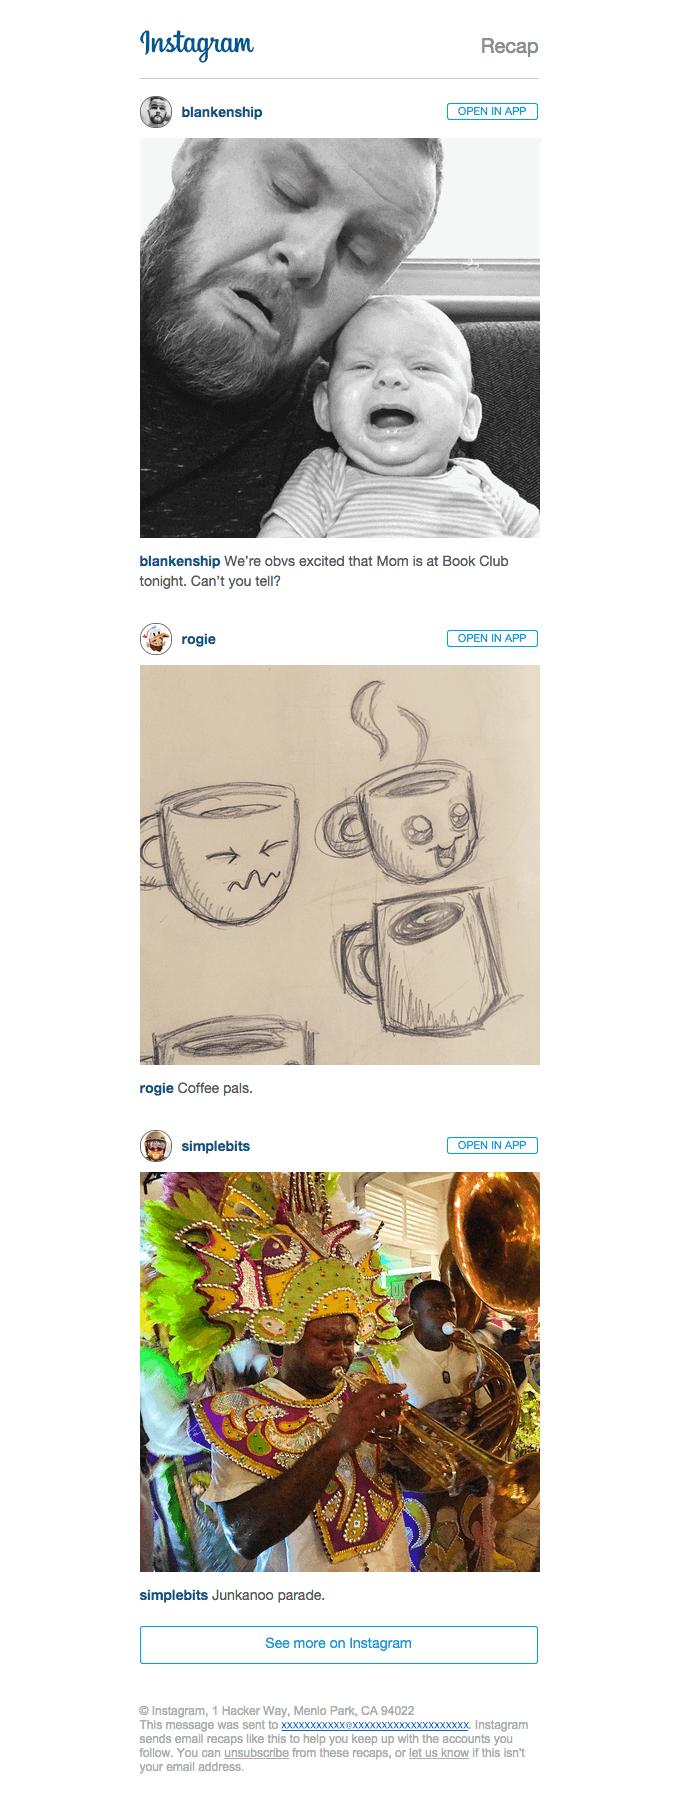 Business email samples-Instagram